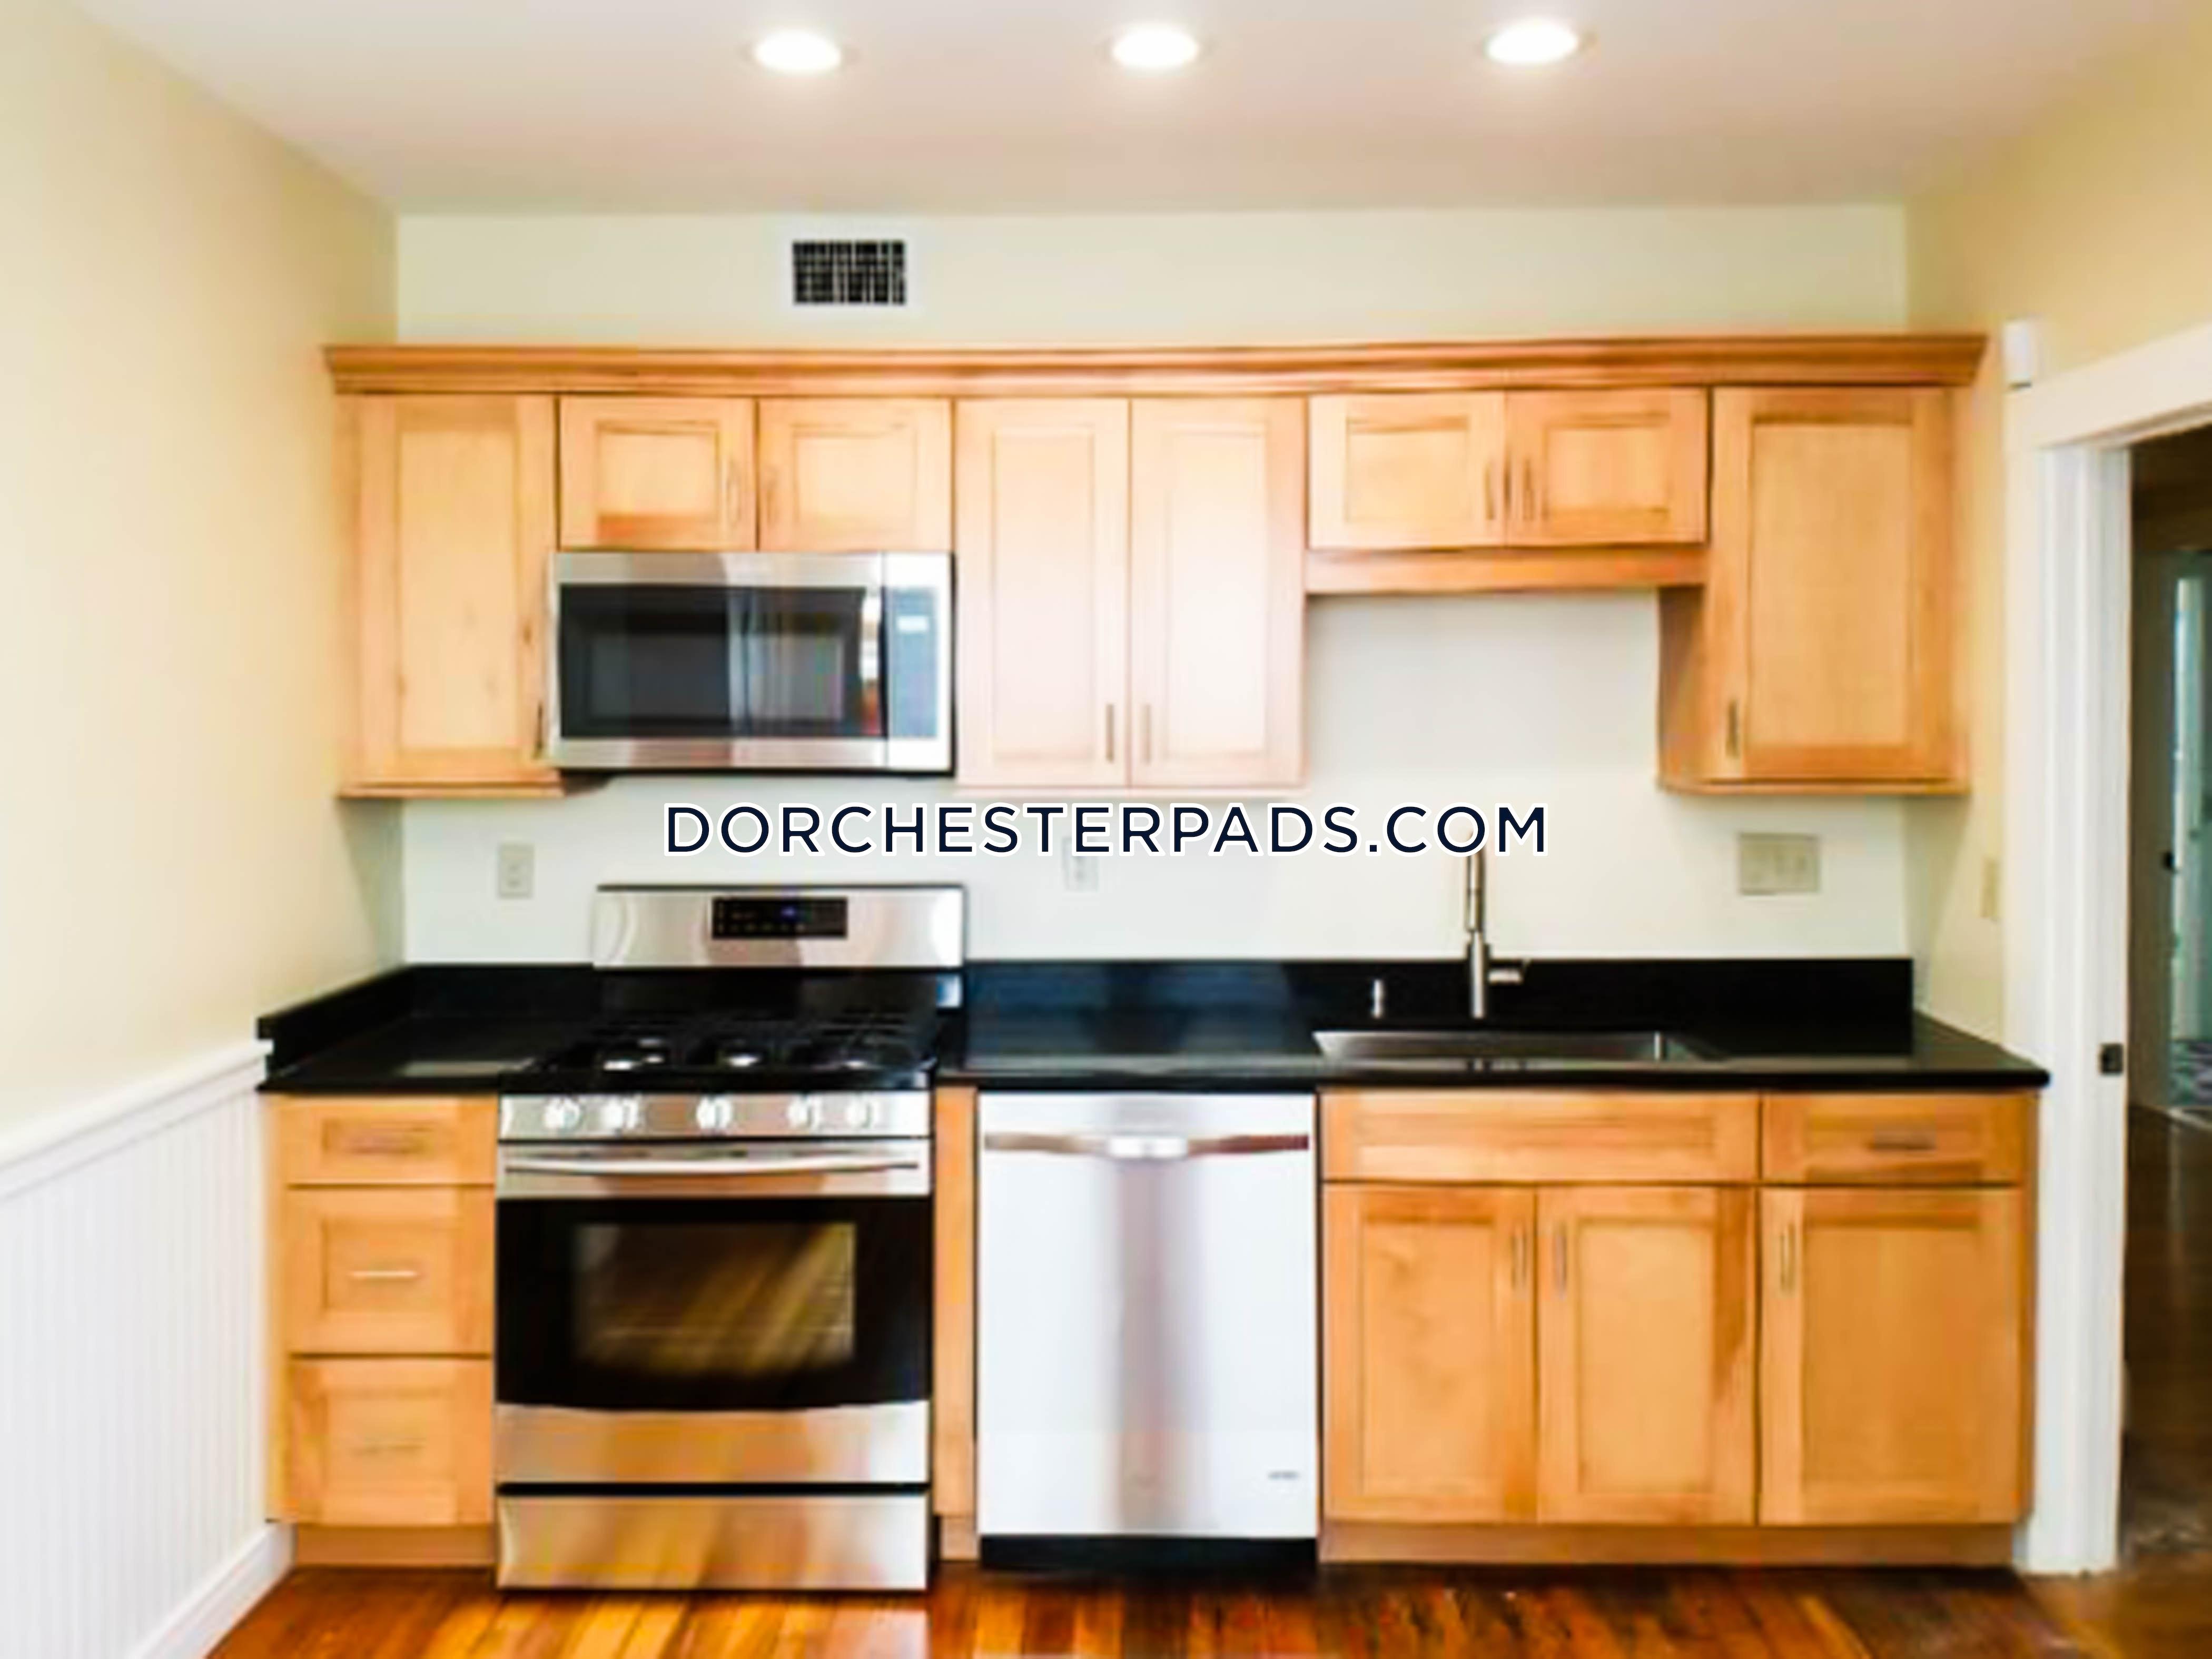 4 Bed Apartment For 3 000 Mo In Boston Dorchester Grove Hall Boston Pads